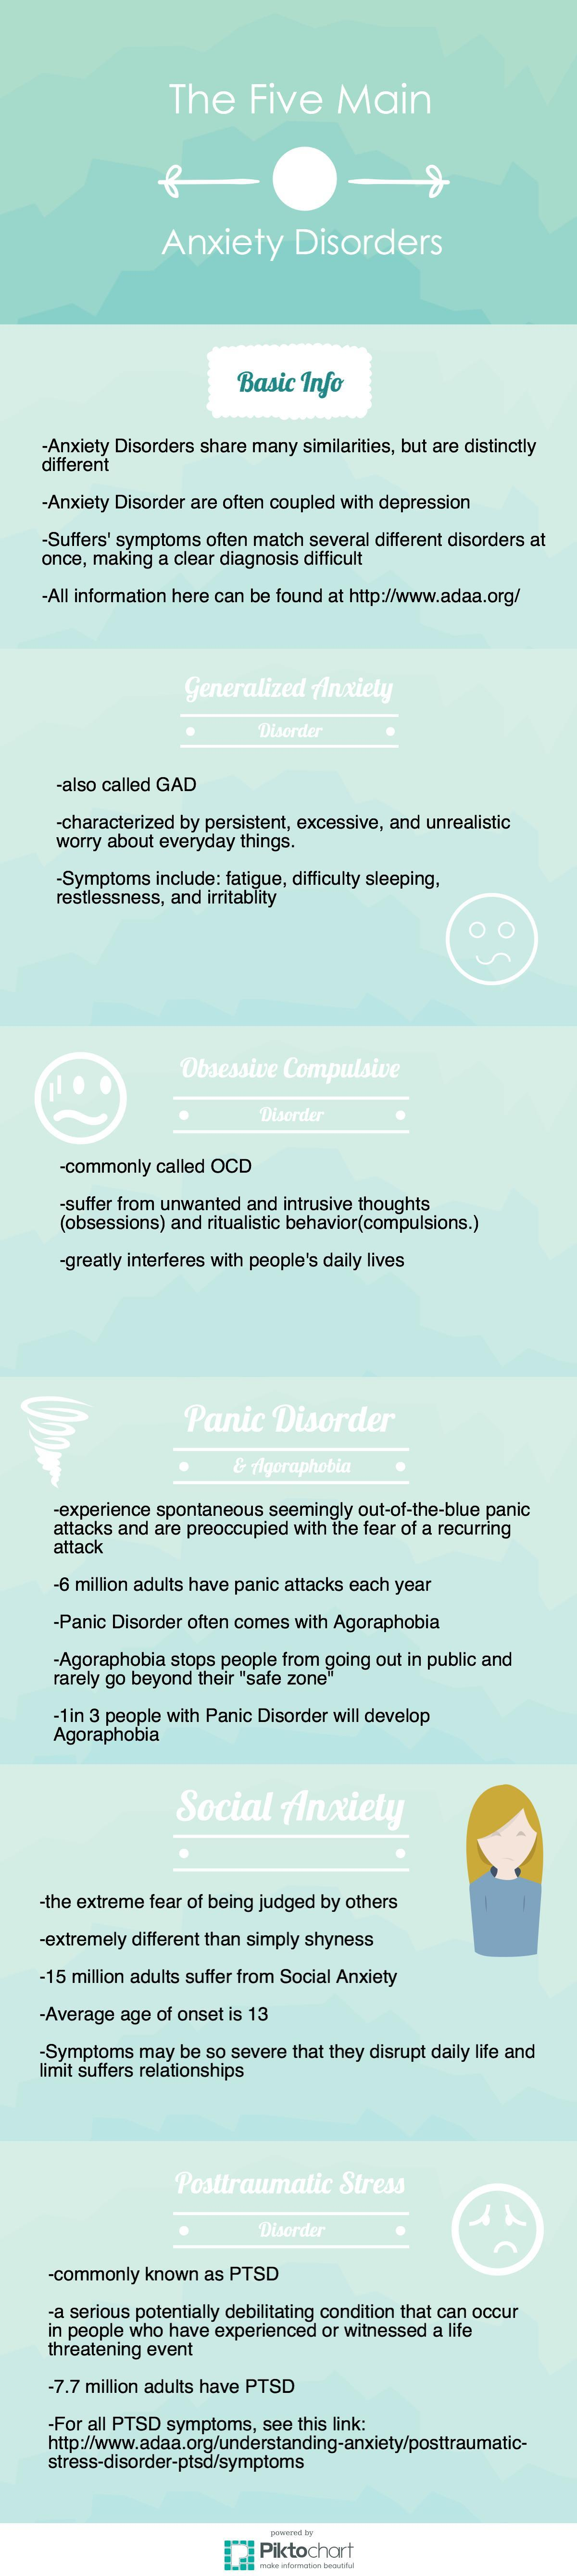 Five Main Anxiety Disorder